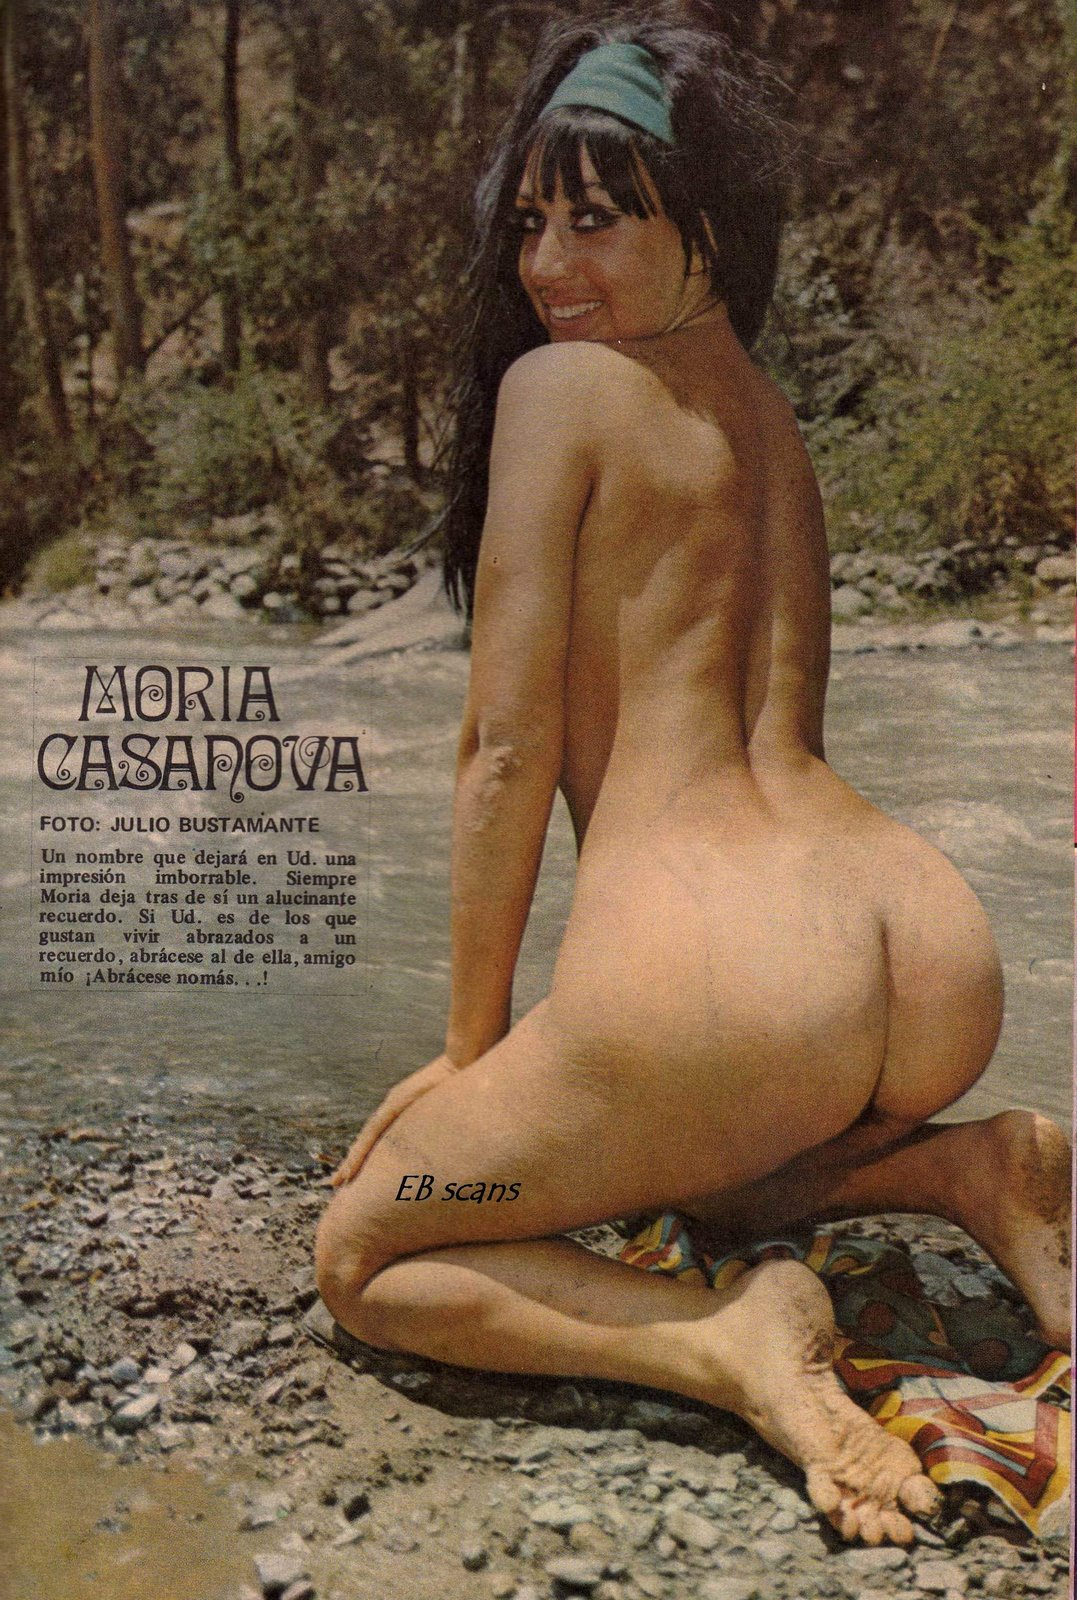 Moria brown naked game nsfw pic